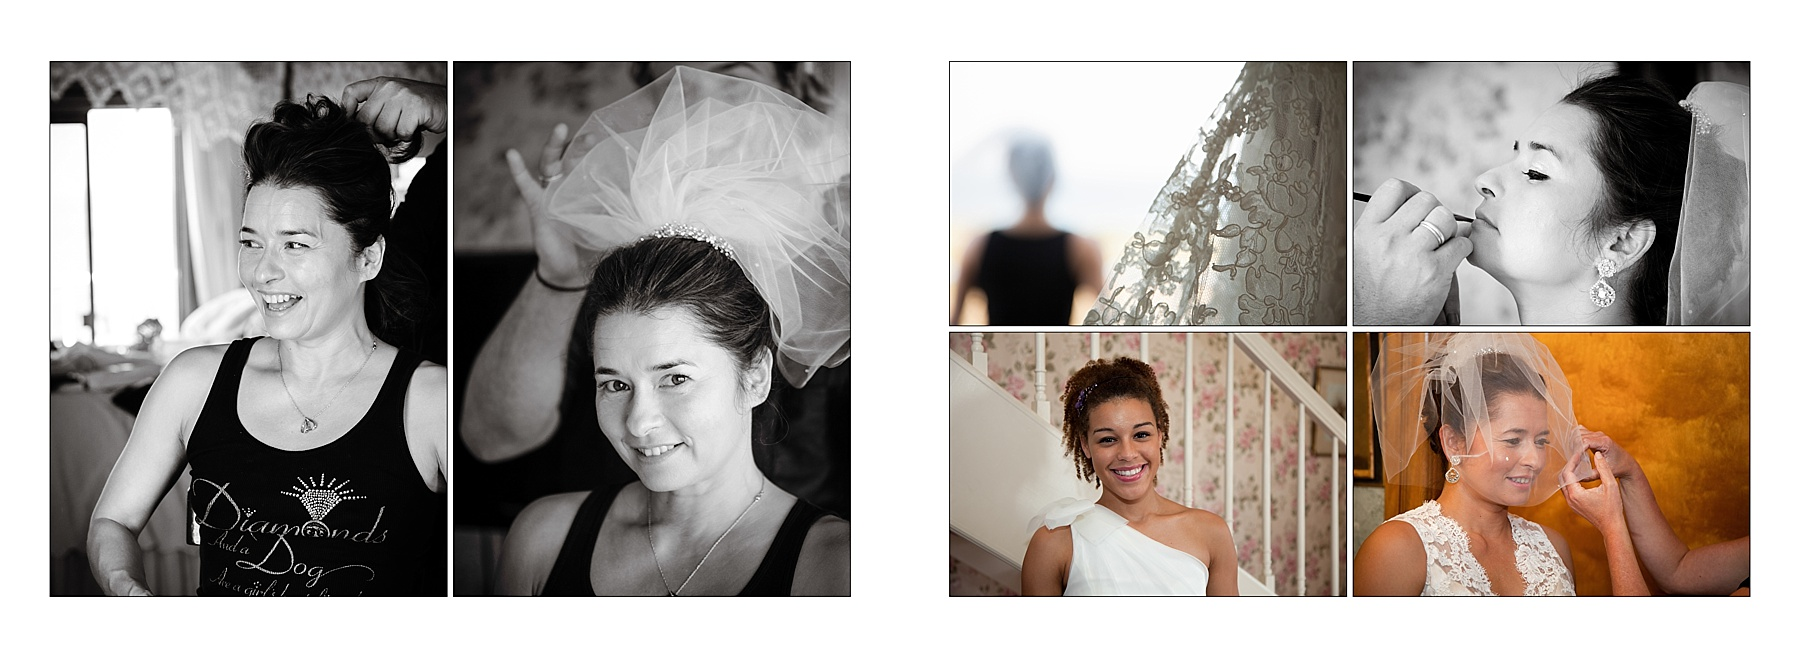 spread03_Wedding Album_Block Island RI WEB.jpg